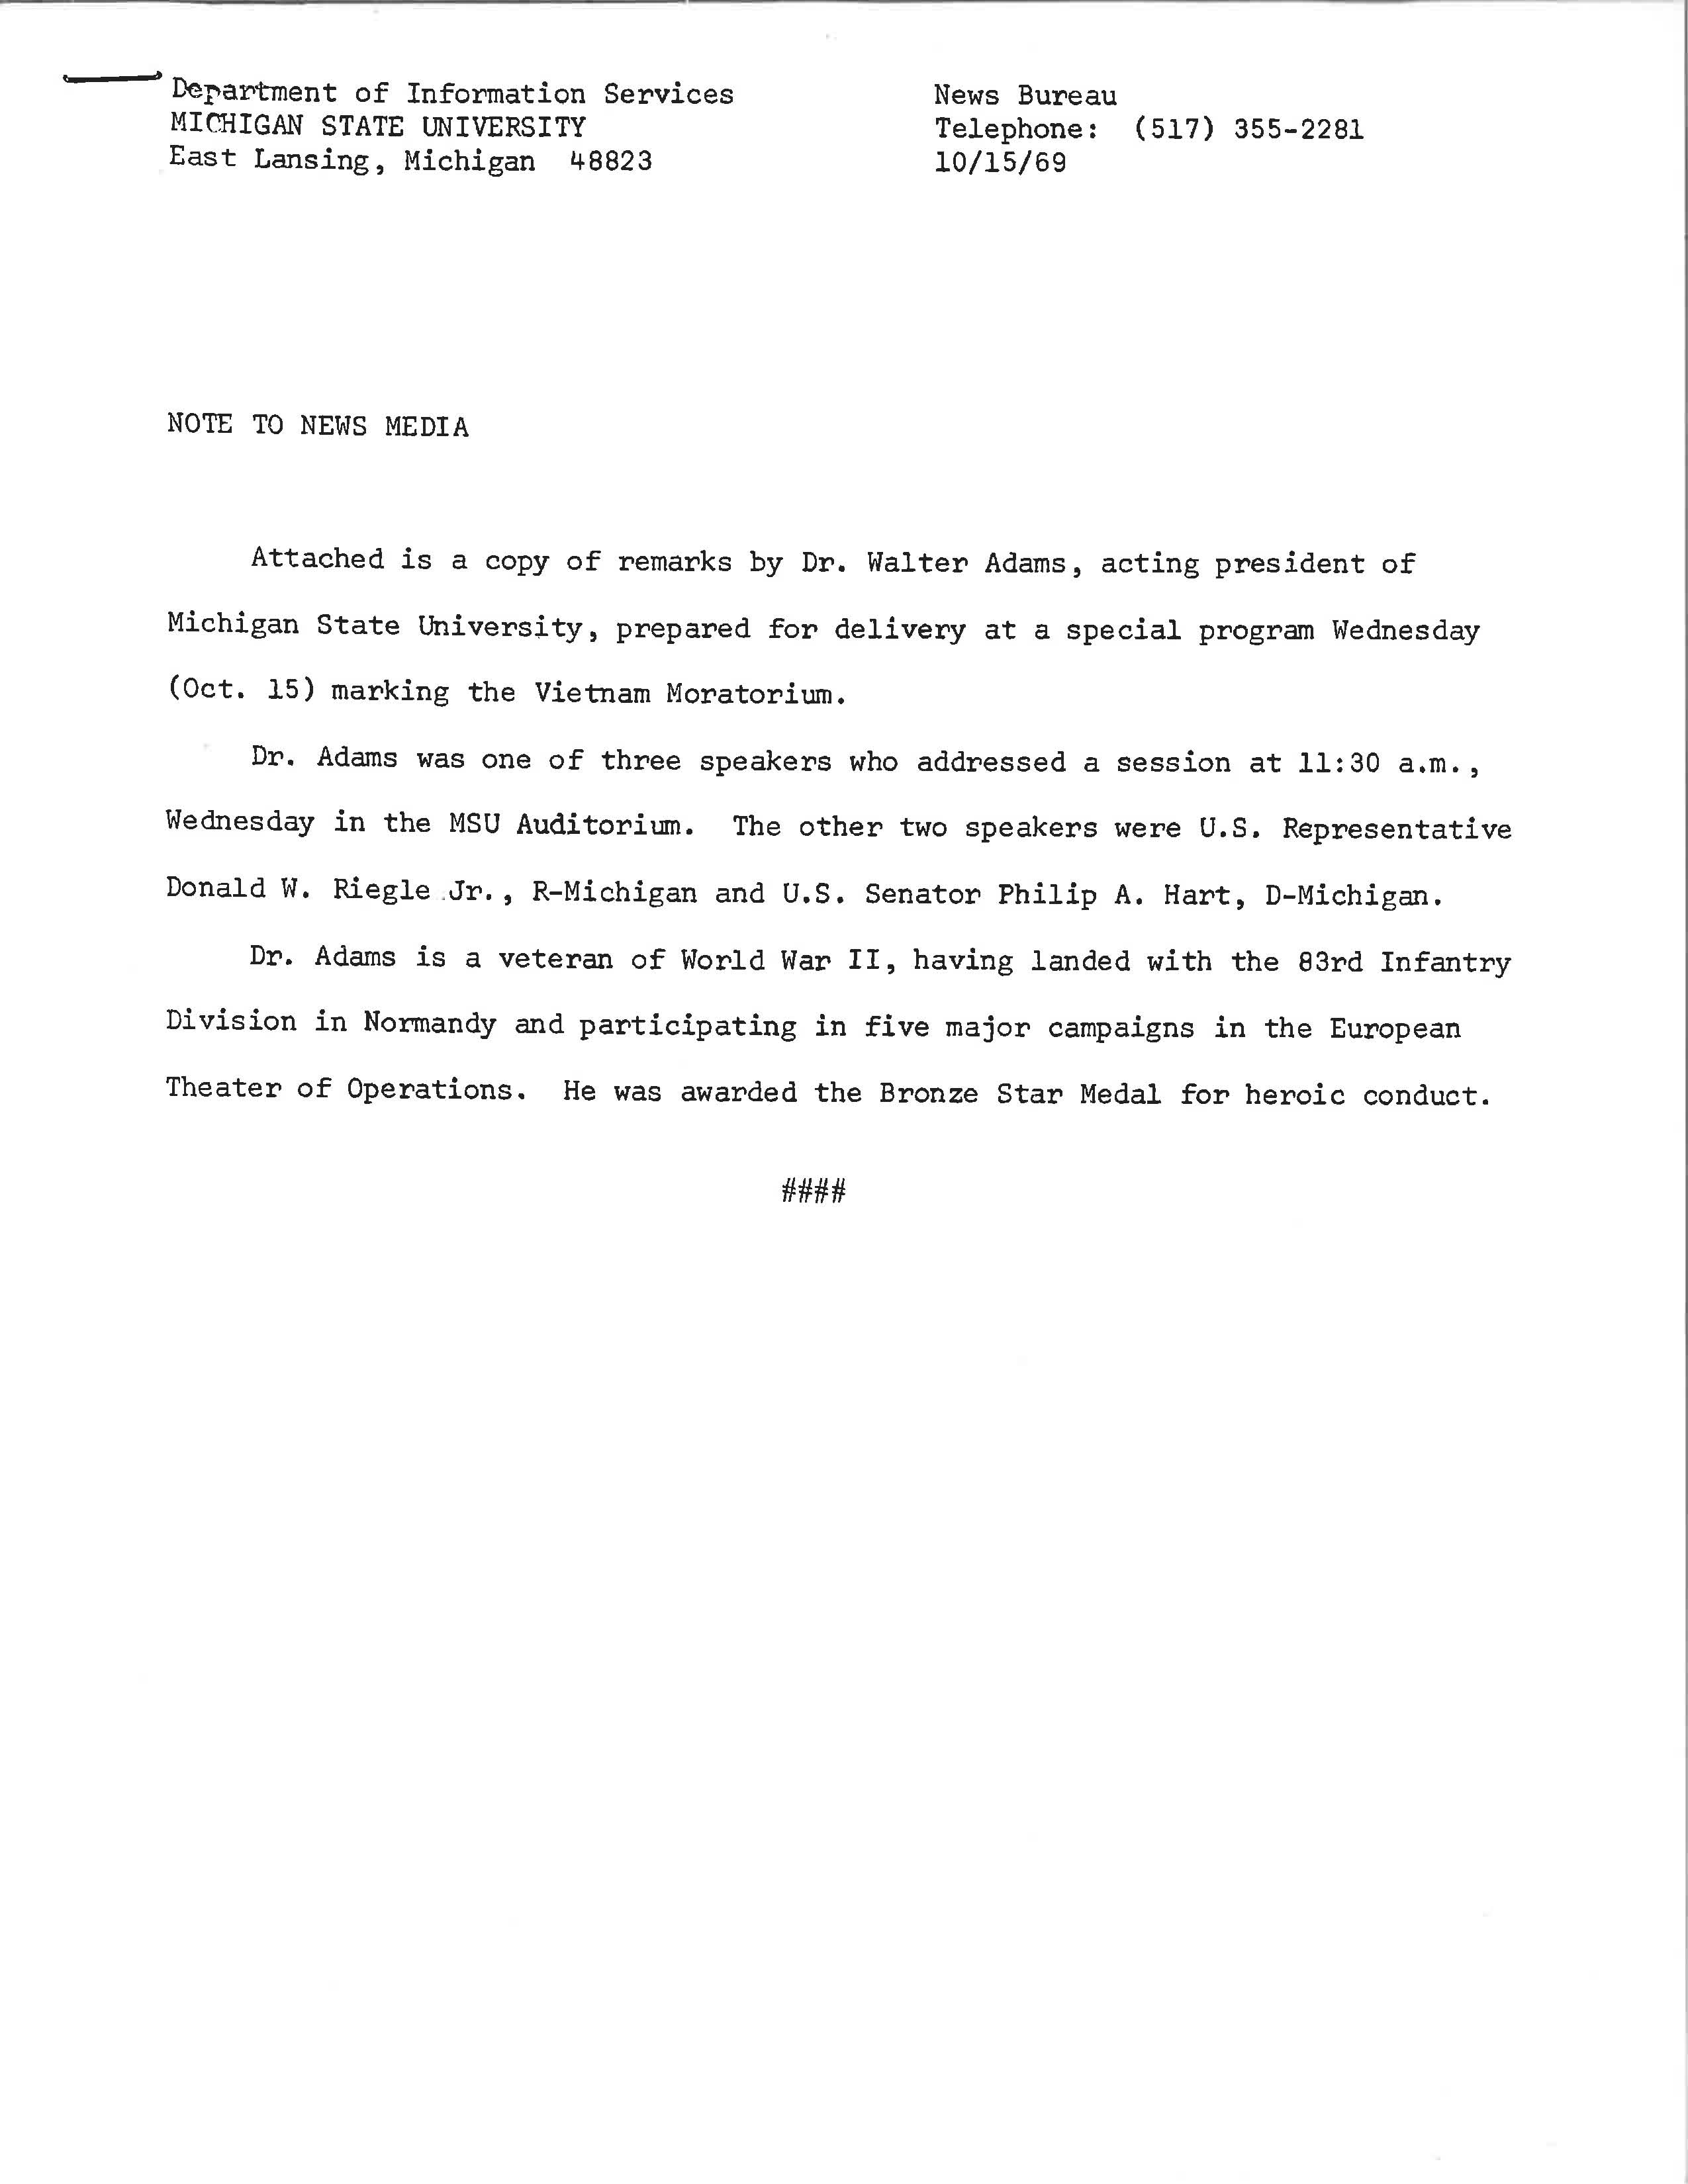 Vietnam Moratorium Walter Adams Remarks